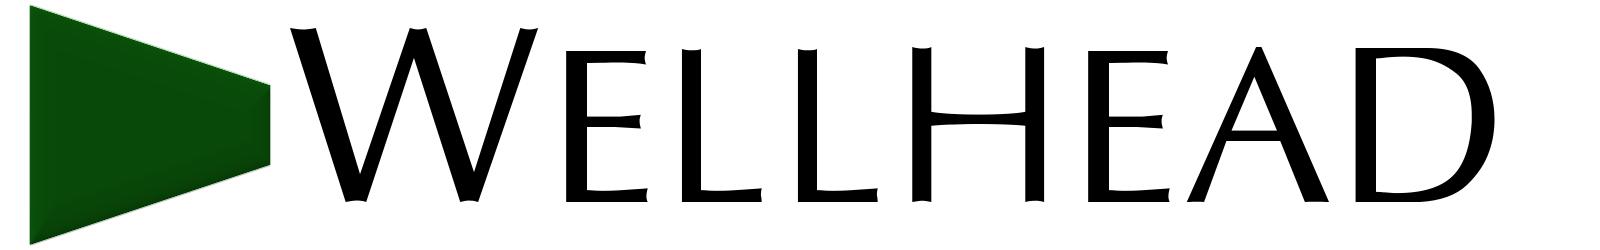 Wellhead Electric Company, Inc